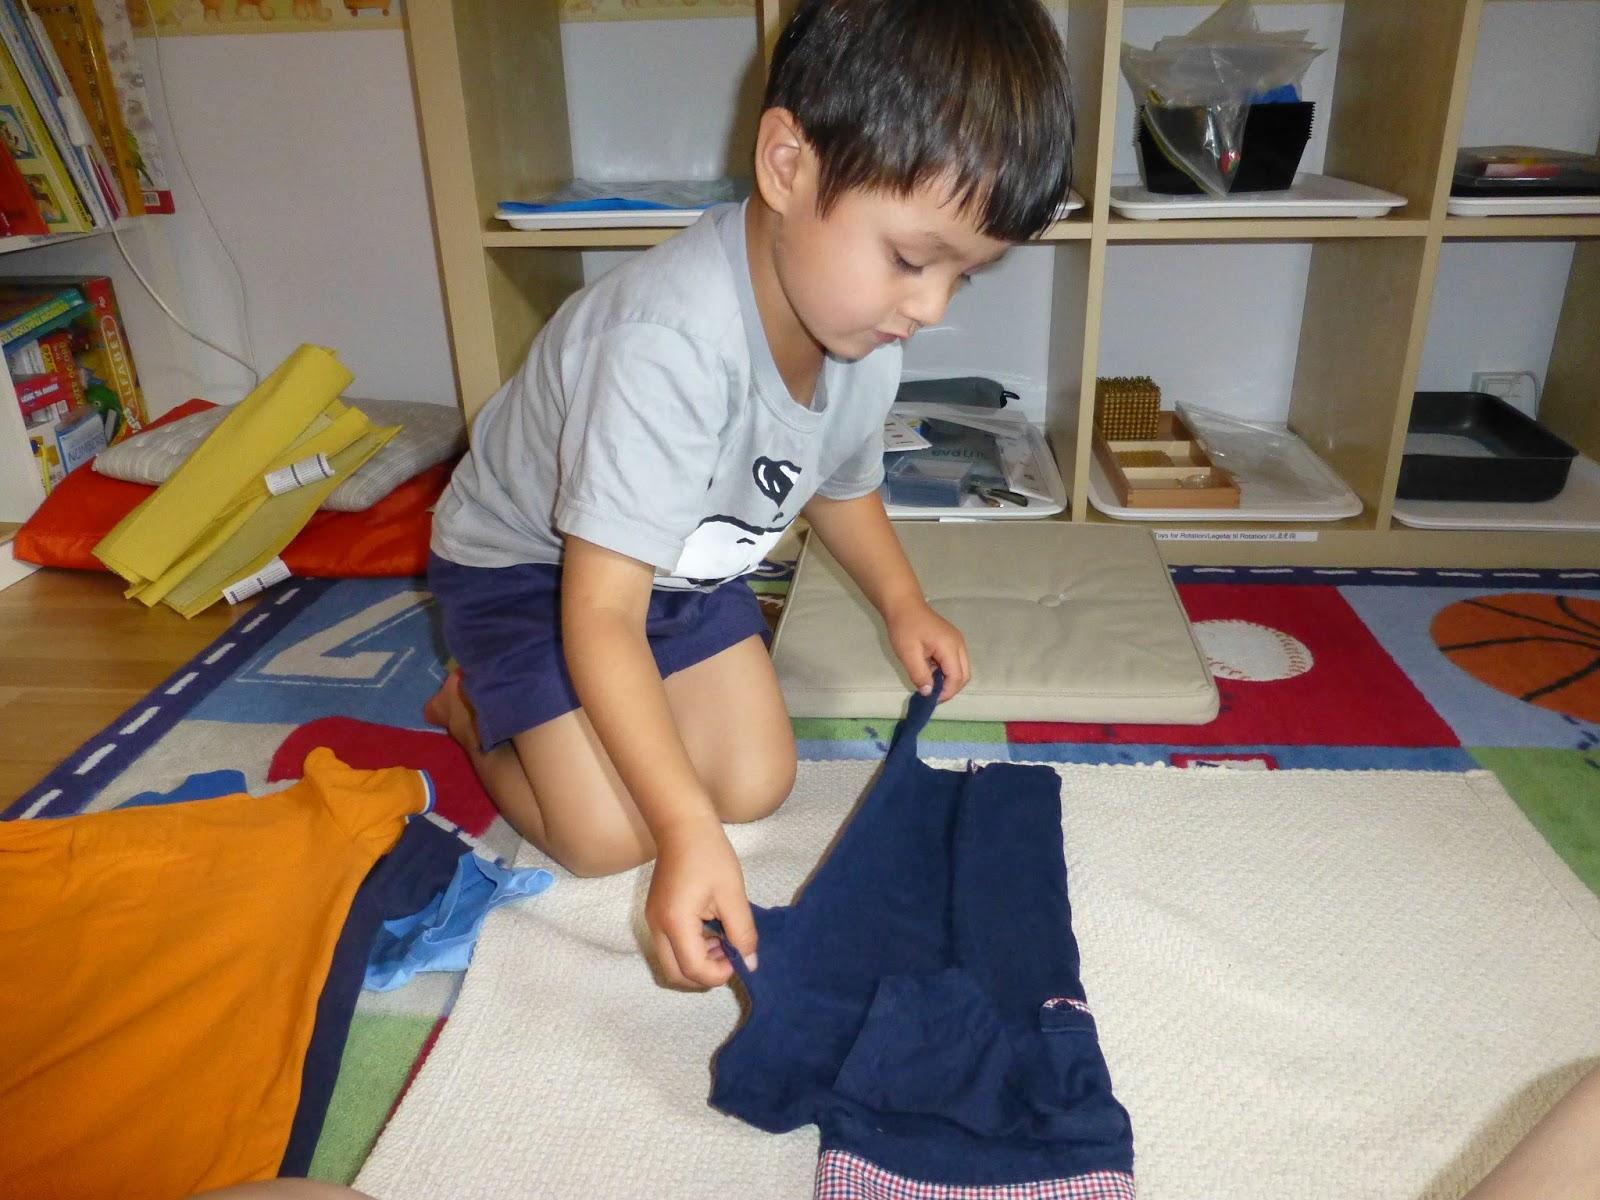 Family FECS Montessori Activity Folding Clothes